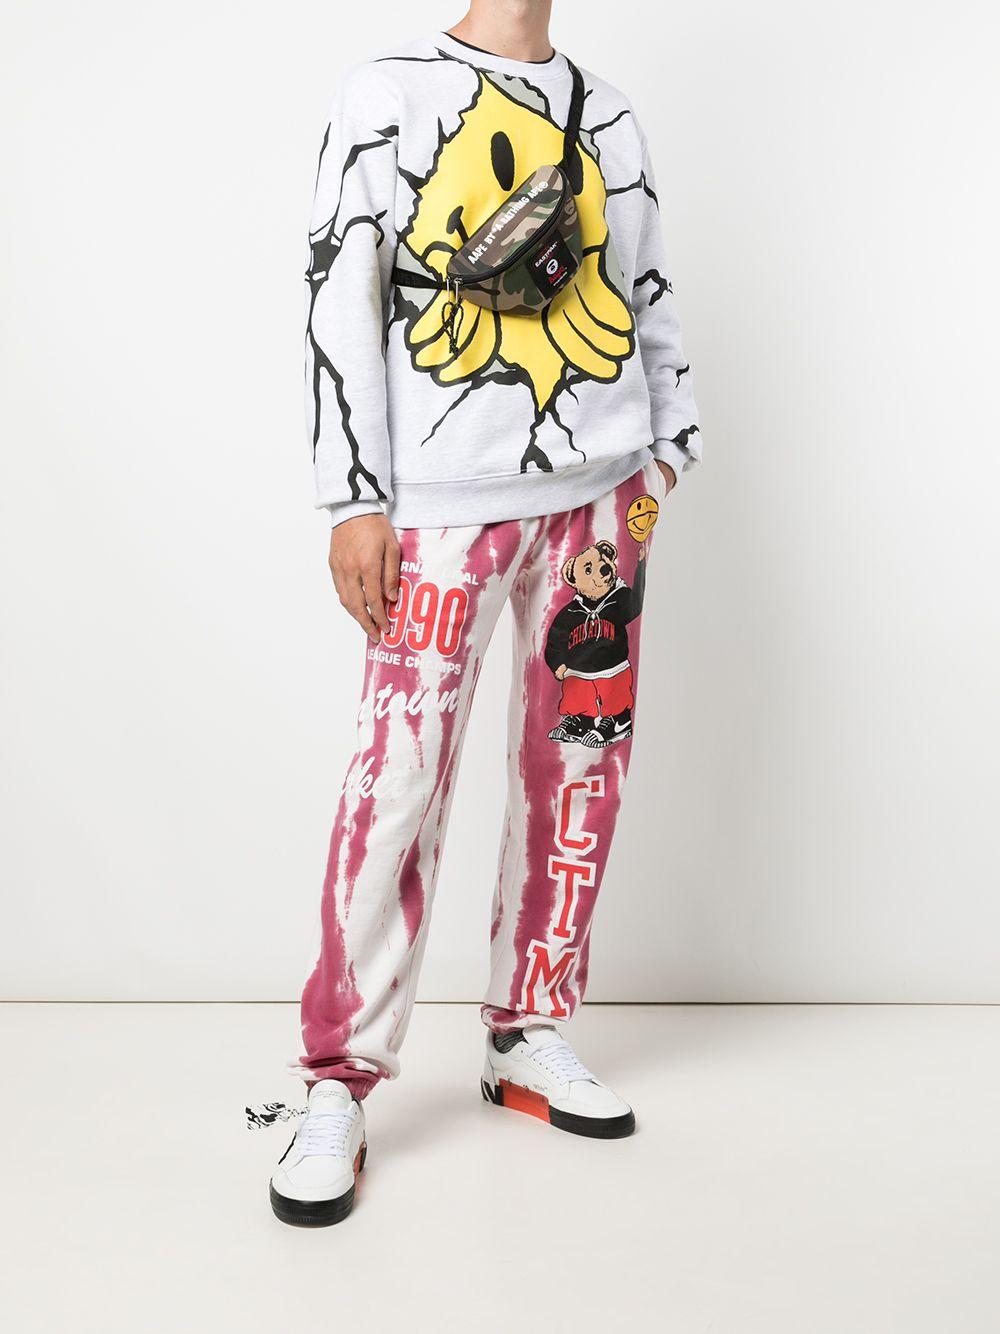 Chinatown market smiley dry wall breaker crewneck man CHINATOWN MARKET | Sweatshirts | 1960052ASH GRAY